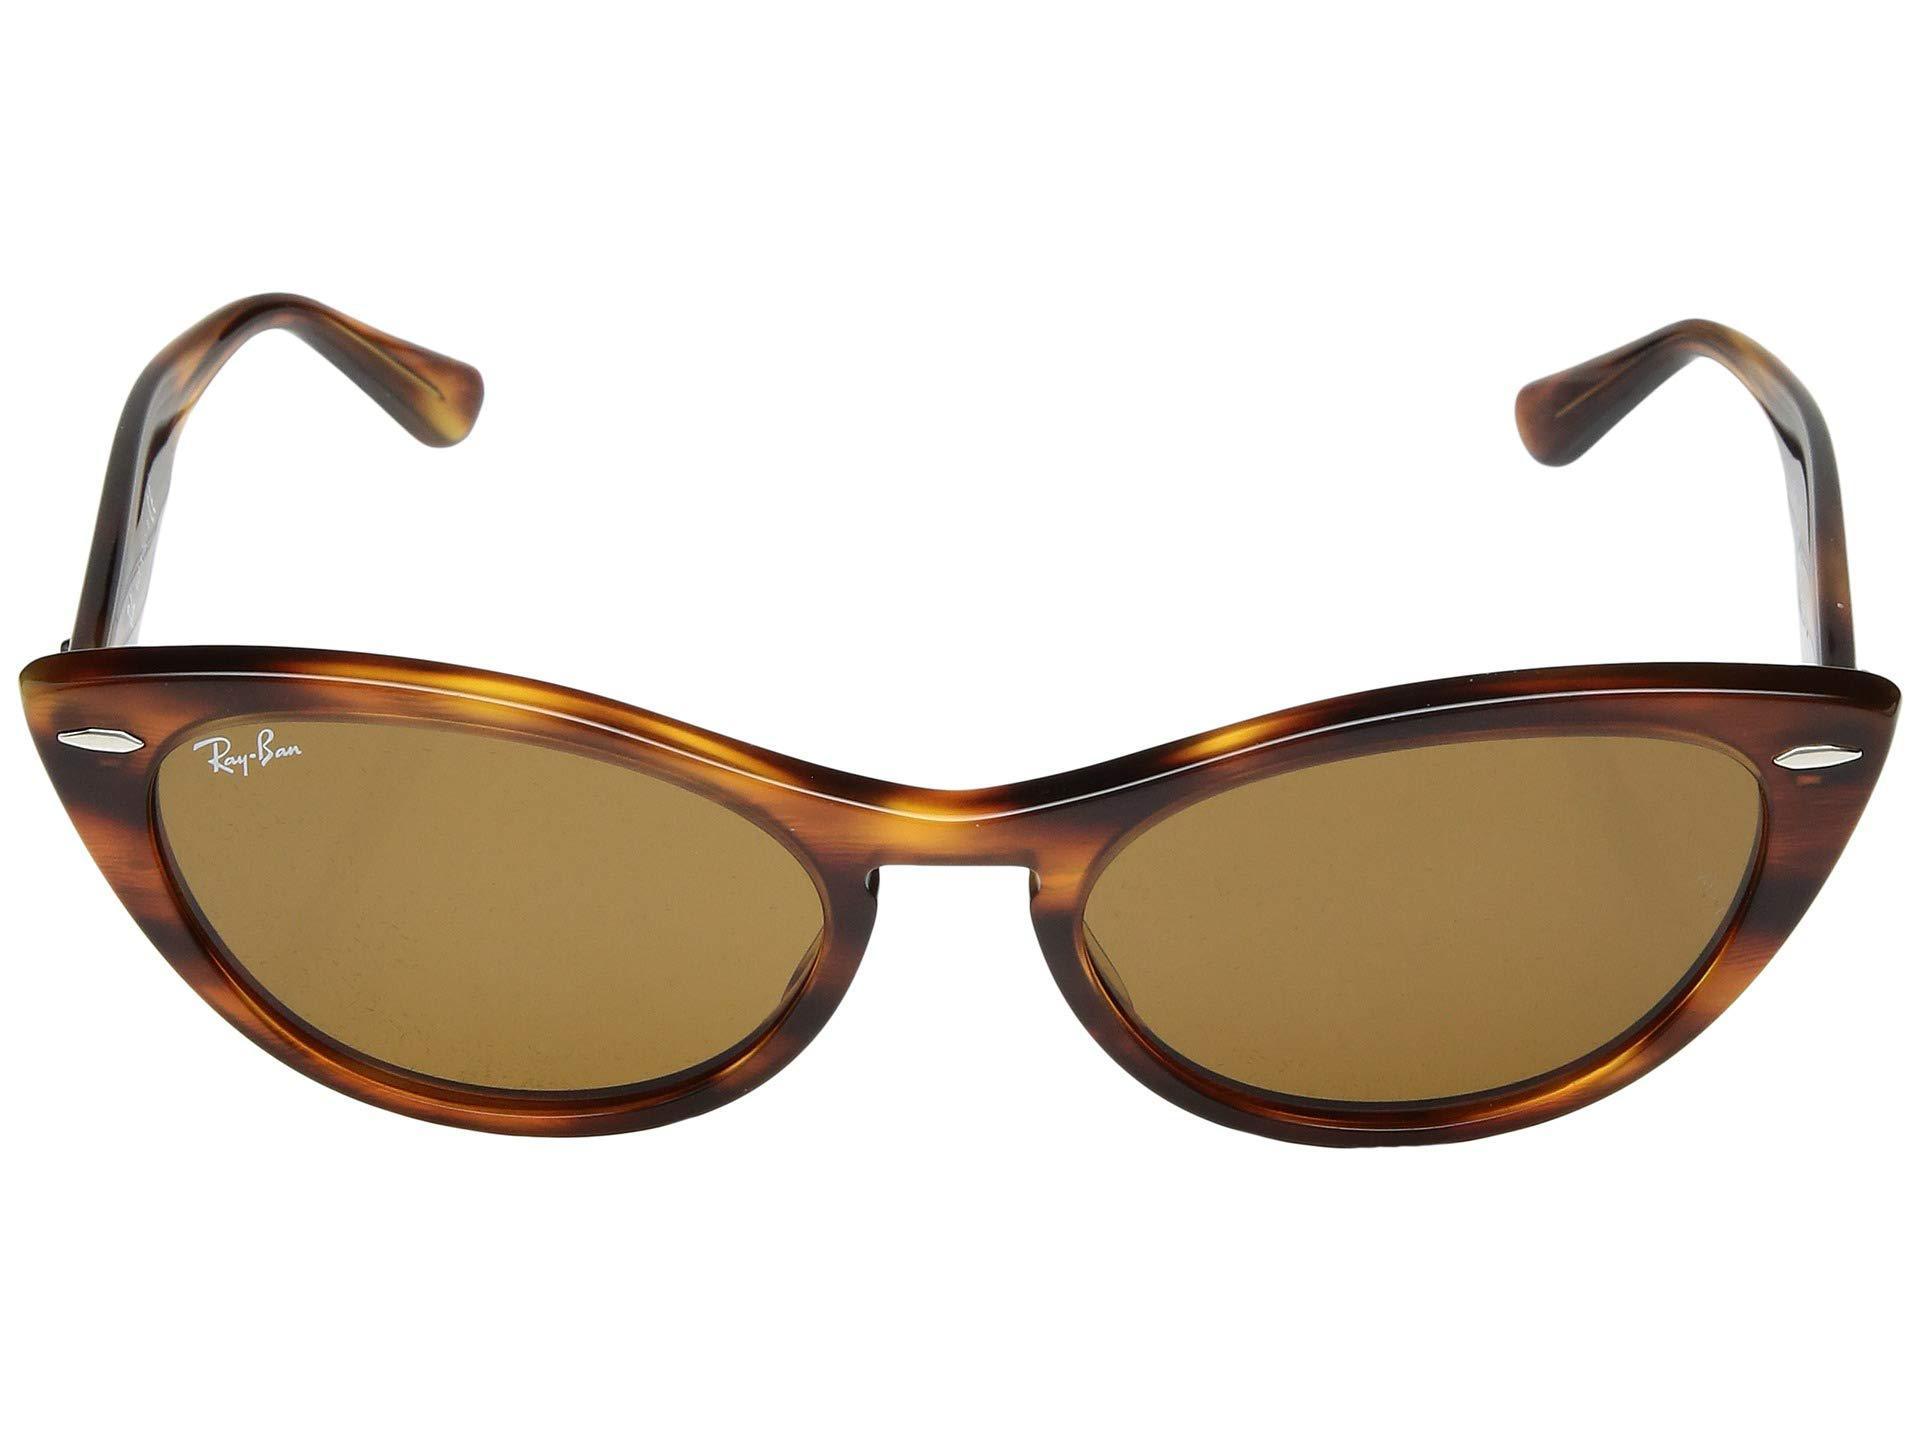 6aace9245b7df Ray-Ban - Brown Rb4314n 54 Mm. (black green) Fashion Sunglasses. View  fullscreen